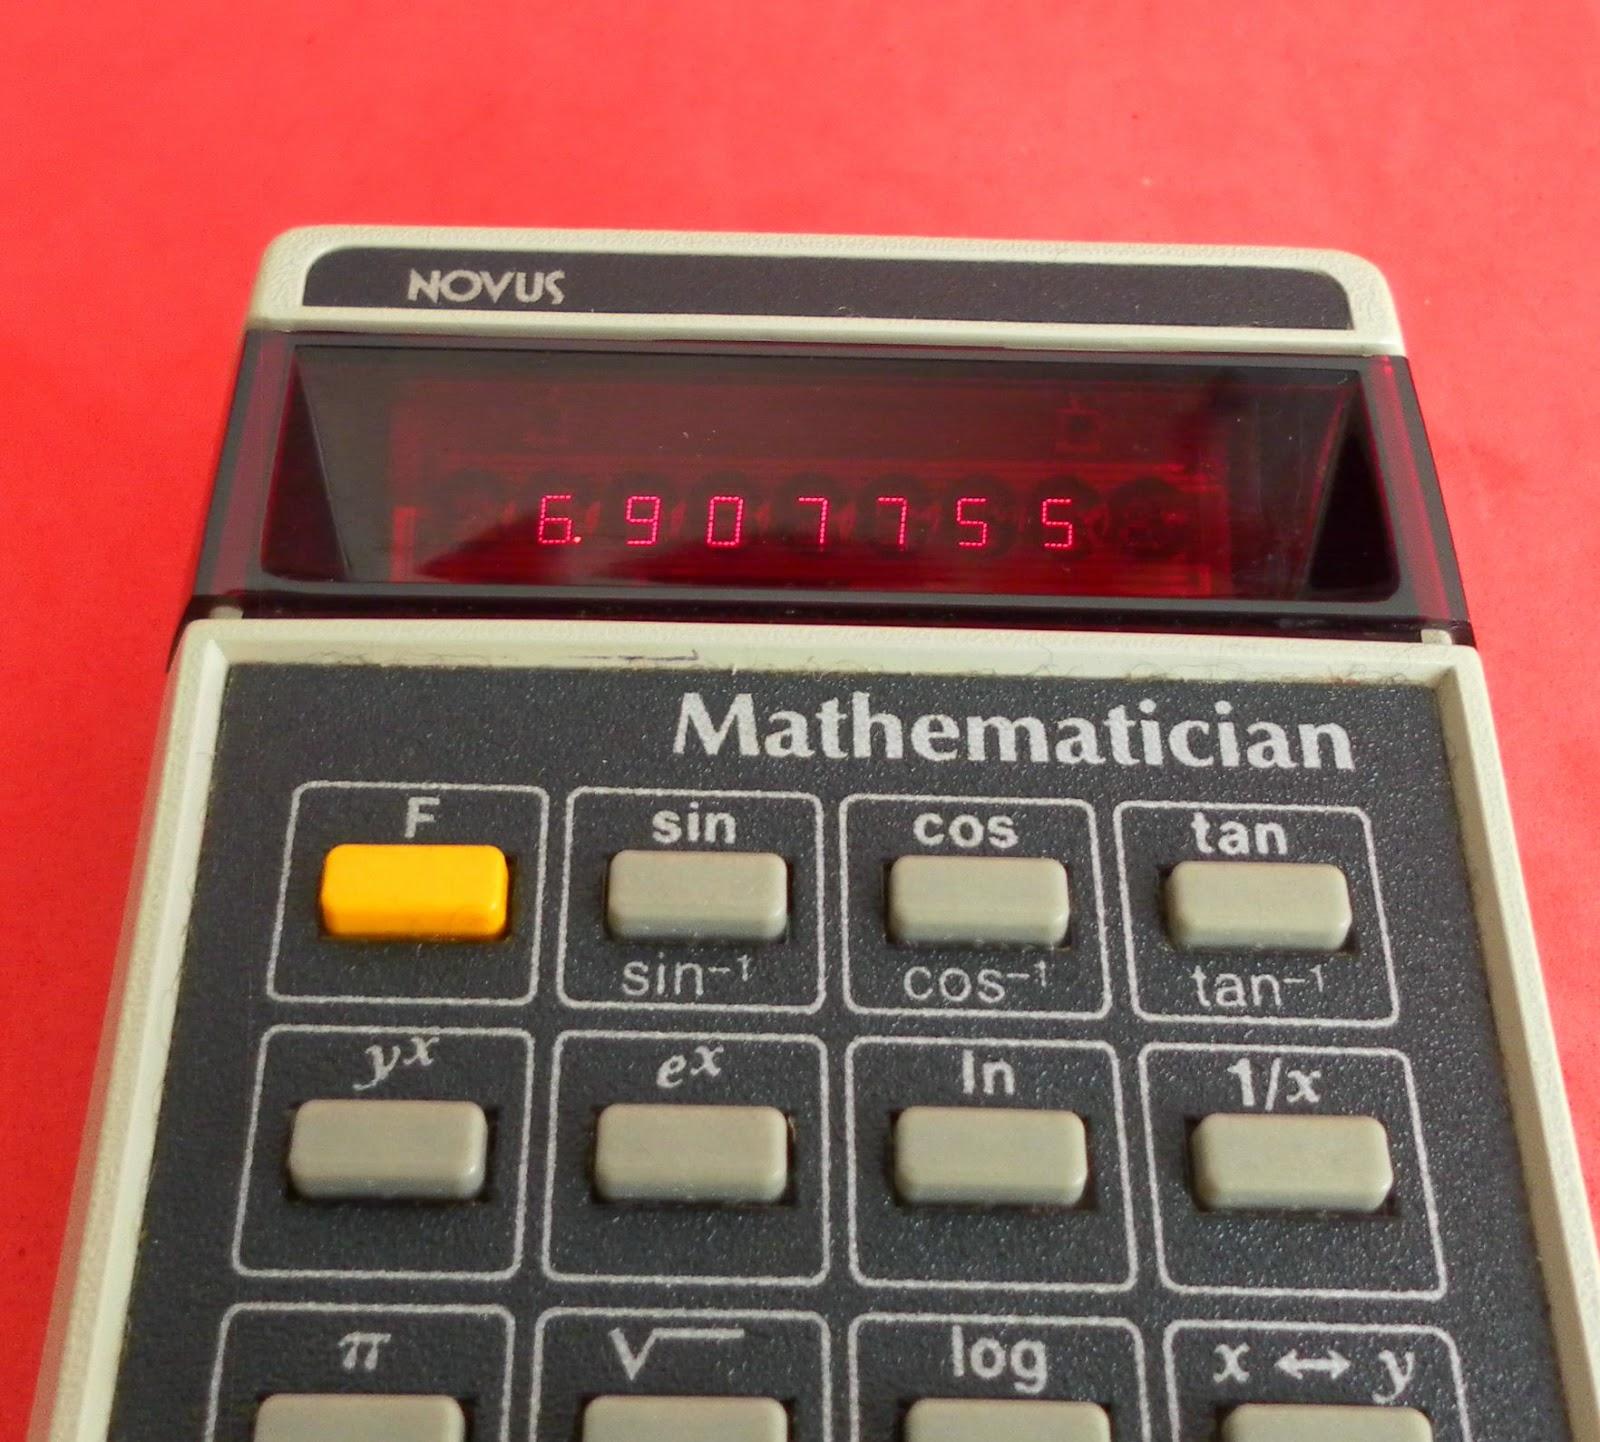 [Image: NS_Novus-4510_Mathematician_015.jpg]